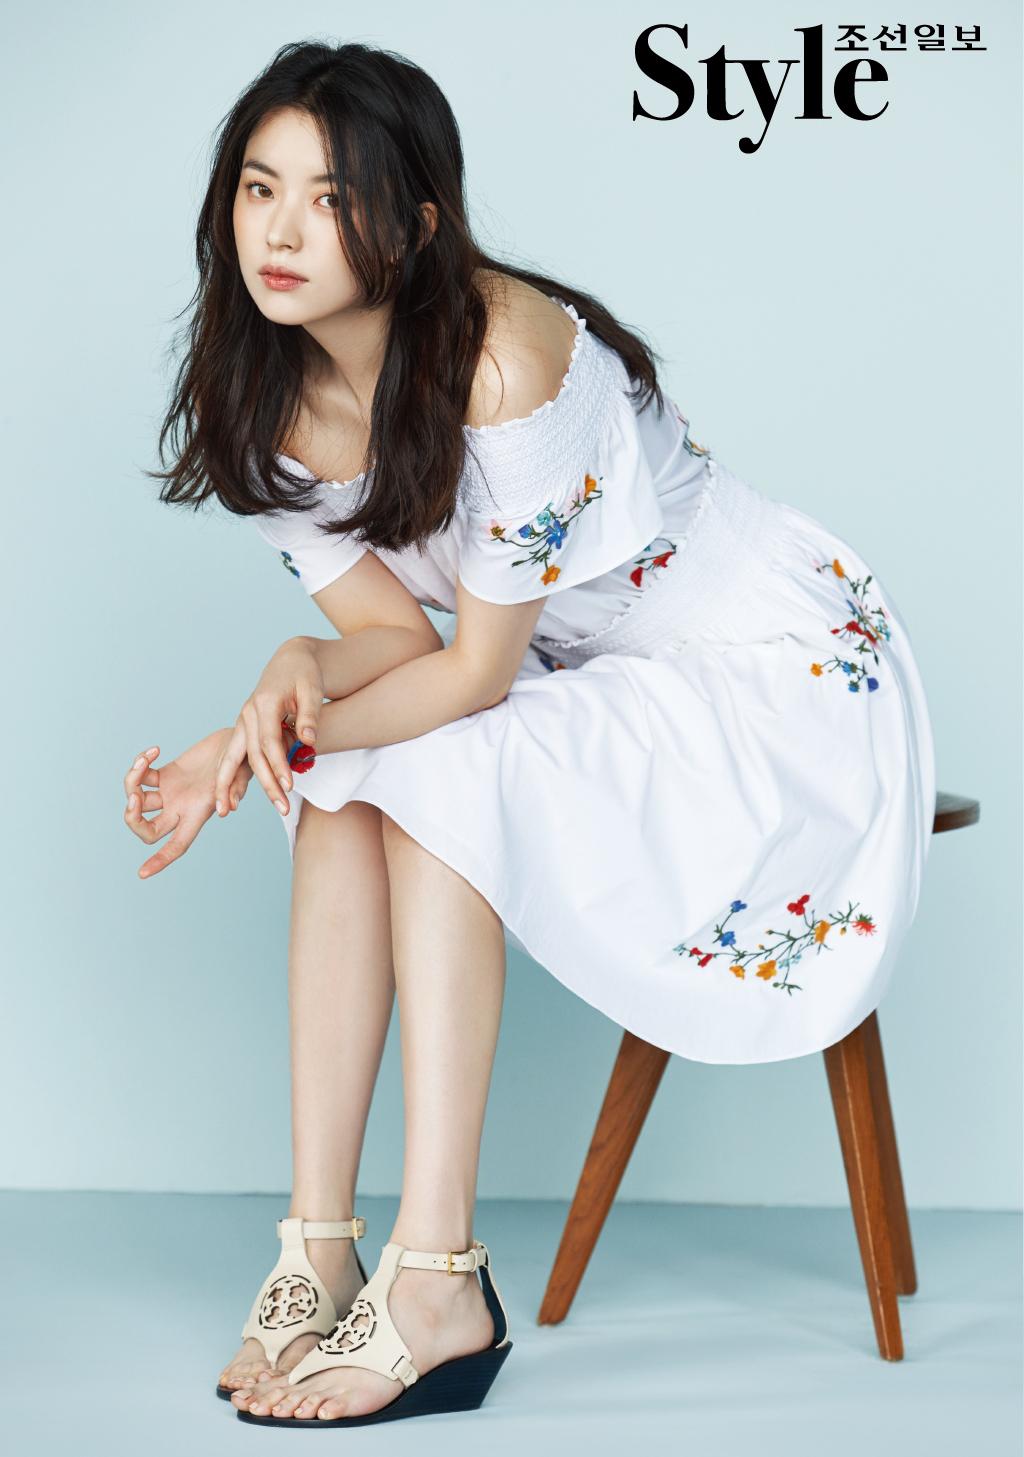 Feet Han Sung Joo naked (57 foto and video), Pussy, Sideboobs, Instagram, underwear 2019